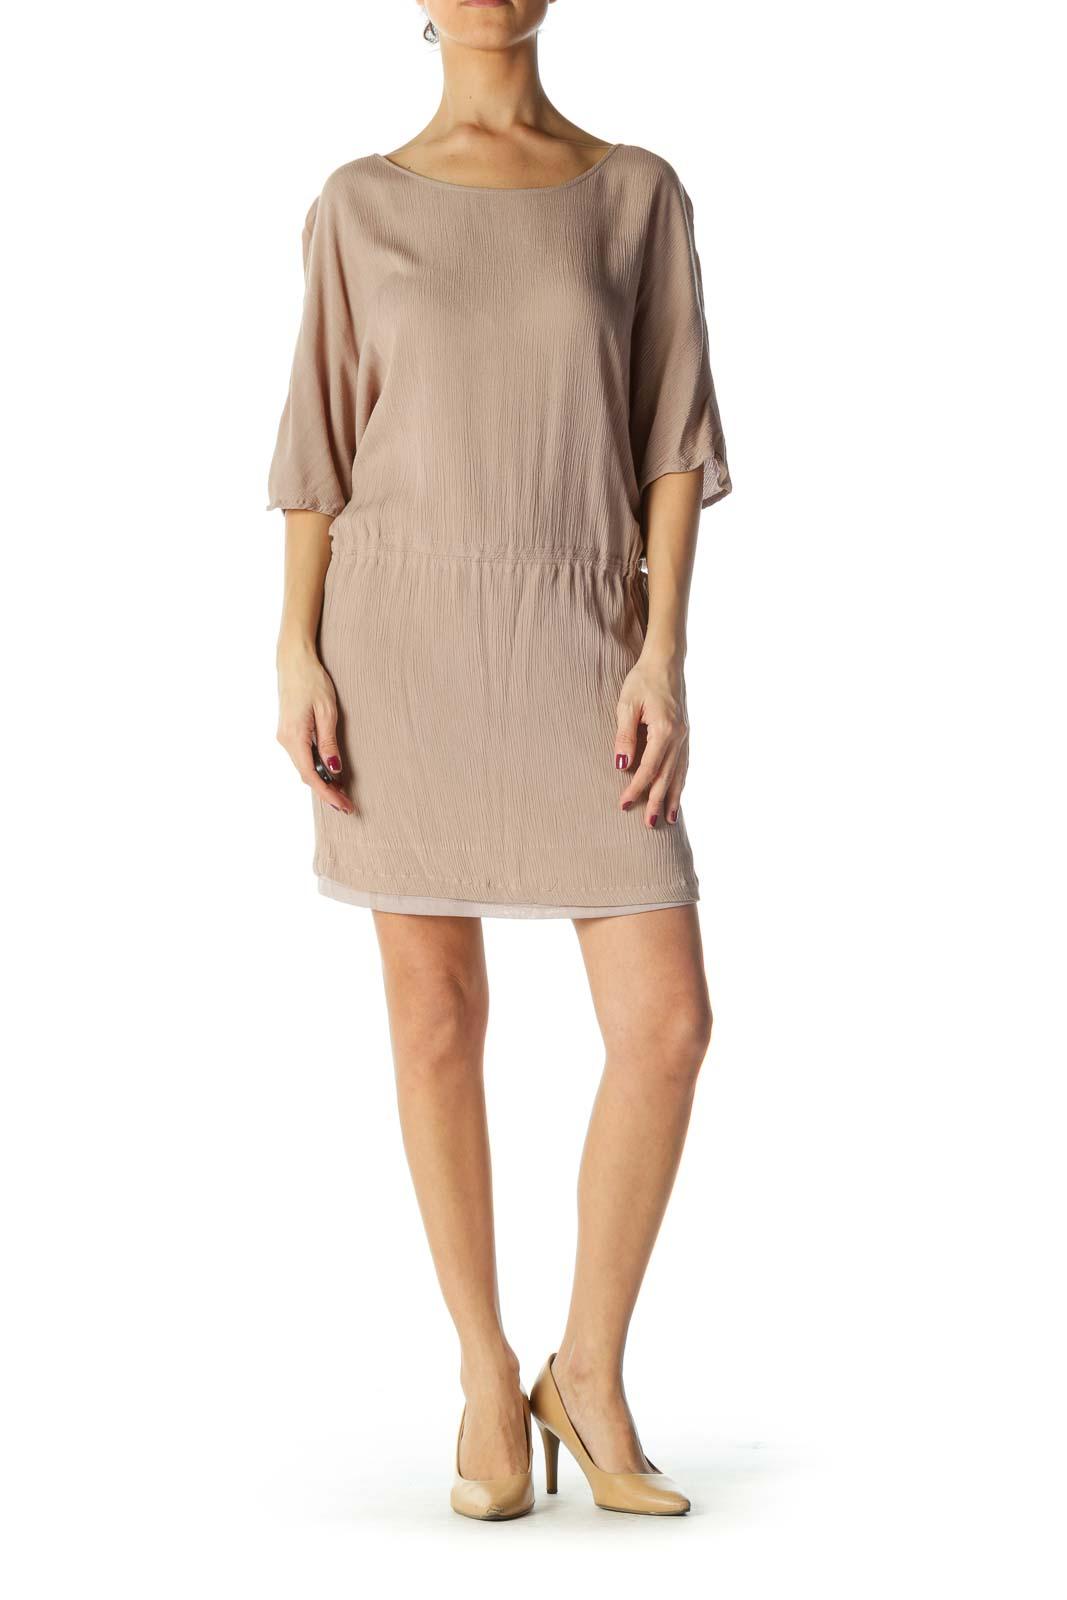 Brown Ribbed Short Sleeve Dress